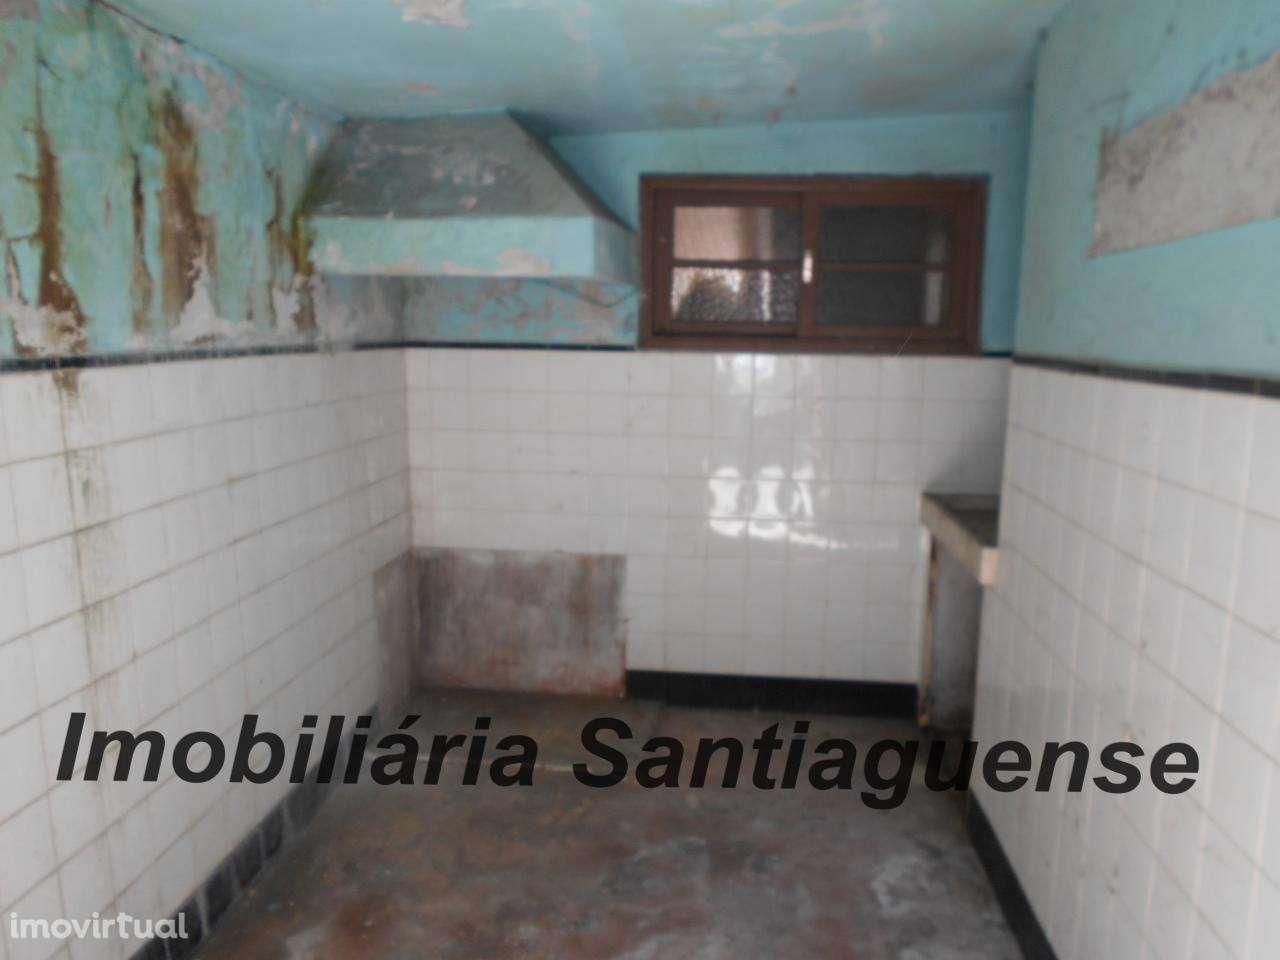 Loja para arrendar, Oliveira de Azeméis, Santiago de Riba-Ul, Ul, Macinhata da Seixa e Madail, Oliveira de Azeméis, Aveiro - Foto 6